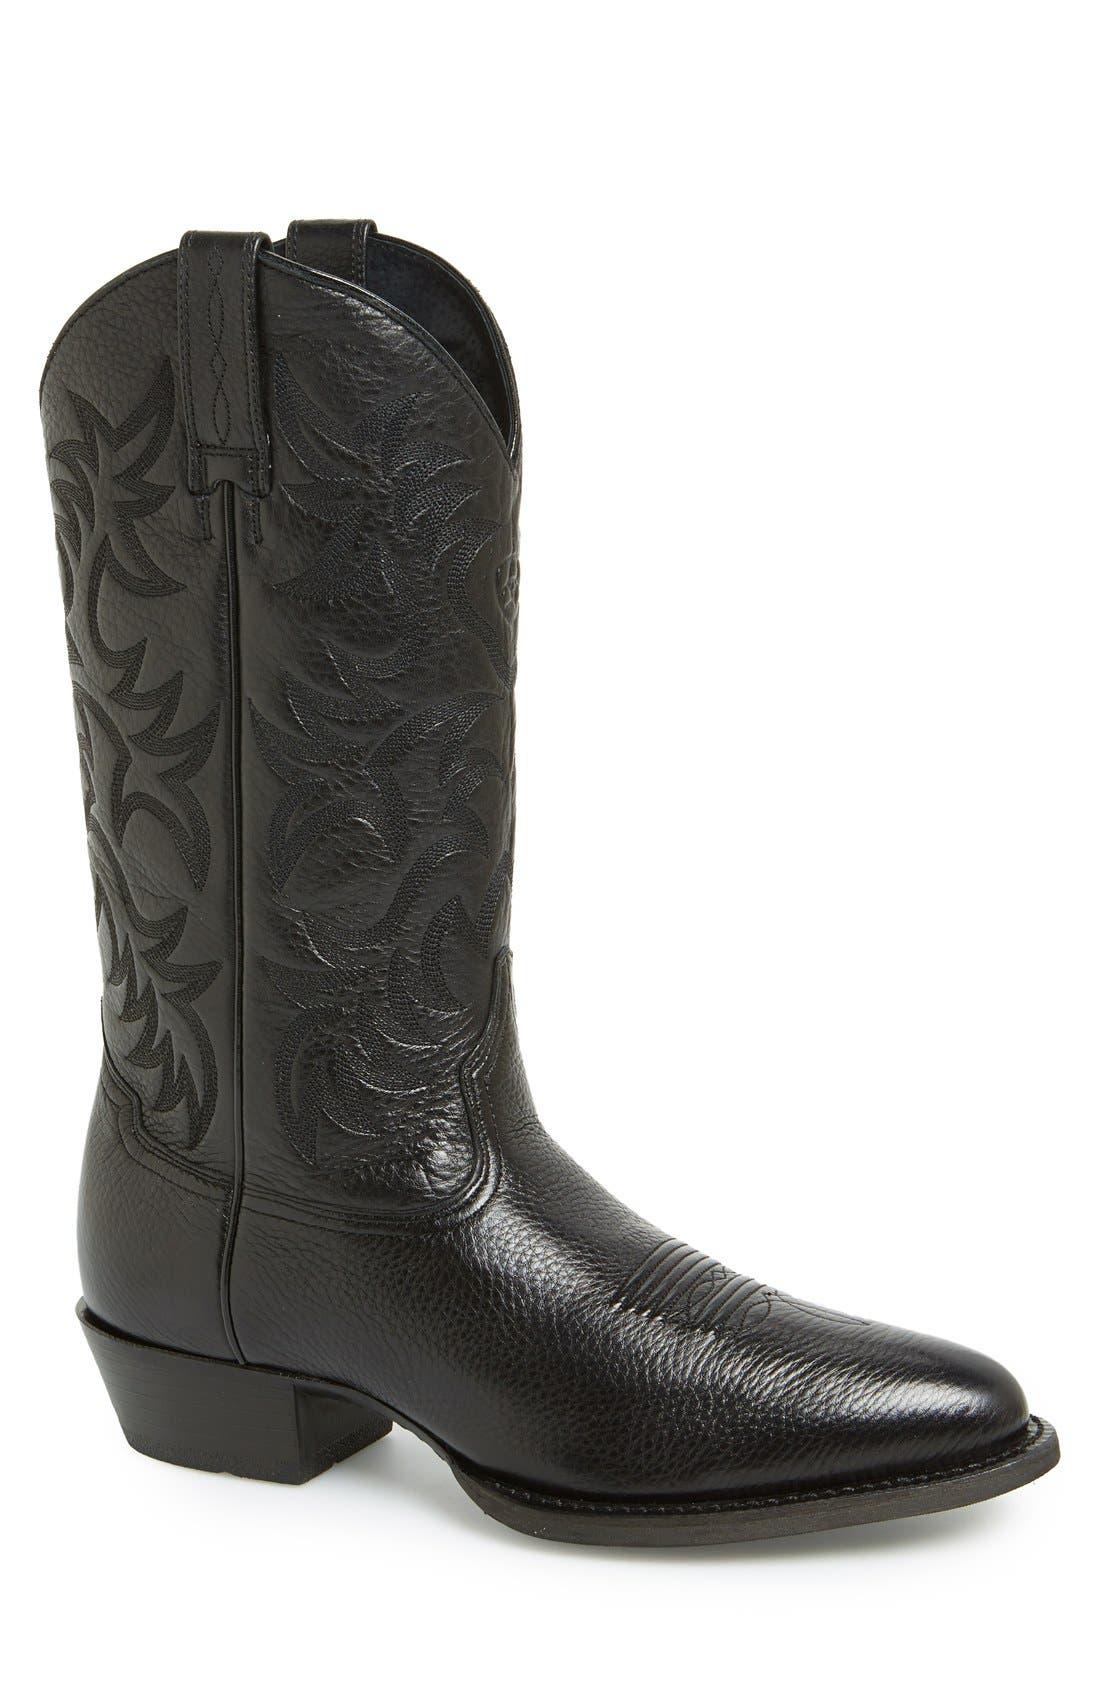 ARIAT 'Heritage' Leather Cowboy R-Toe Boot, Main, color, BLACK DEERTAN